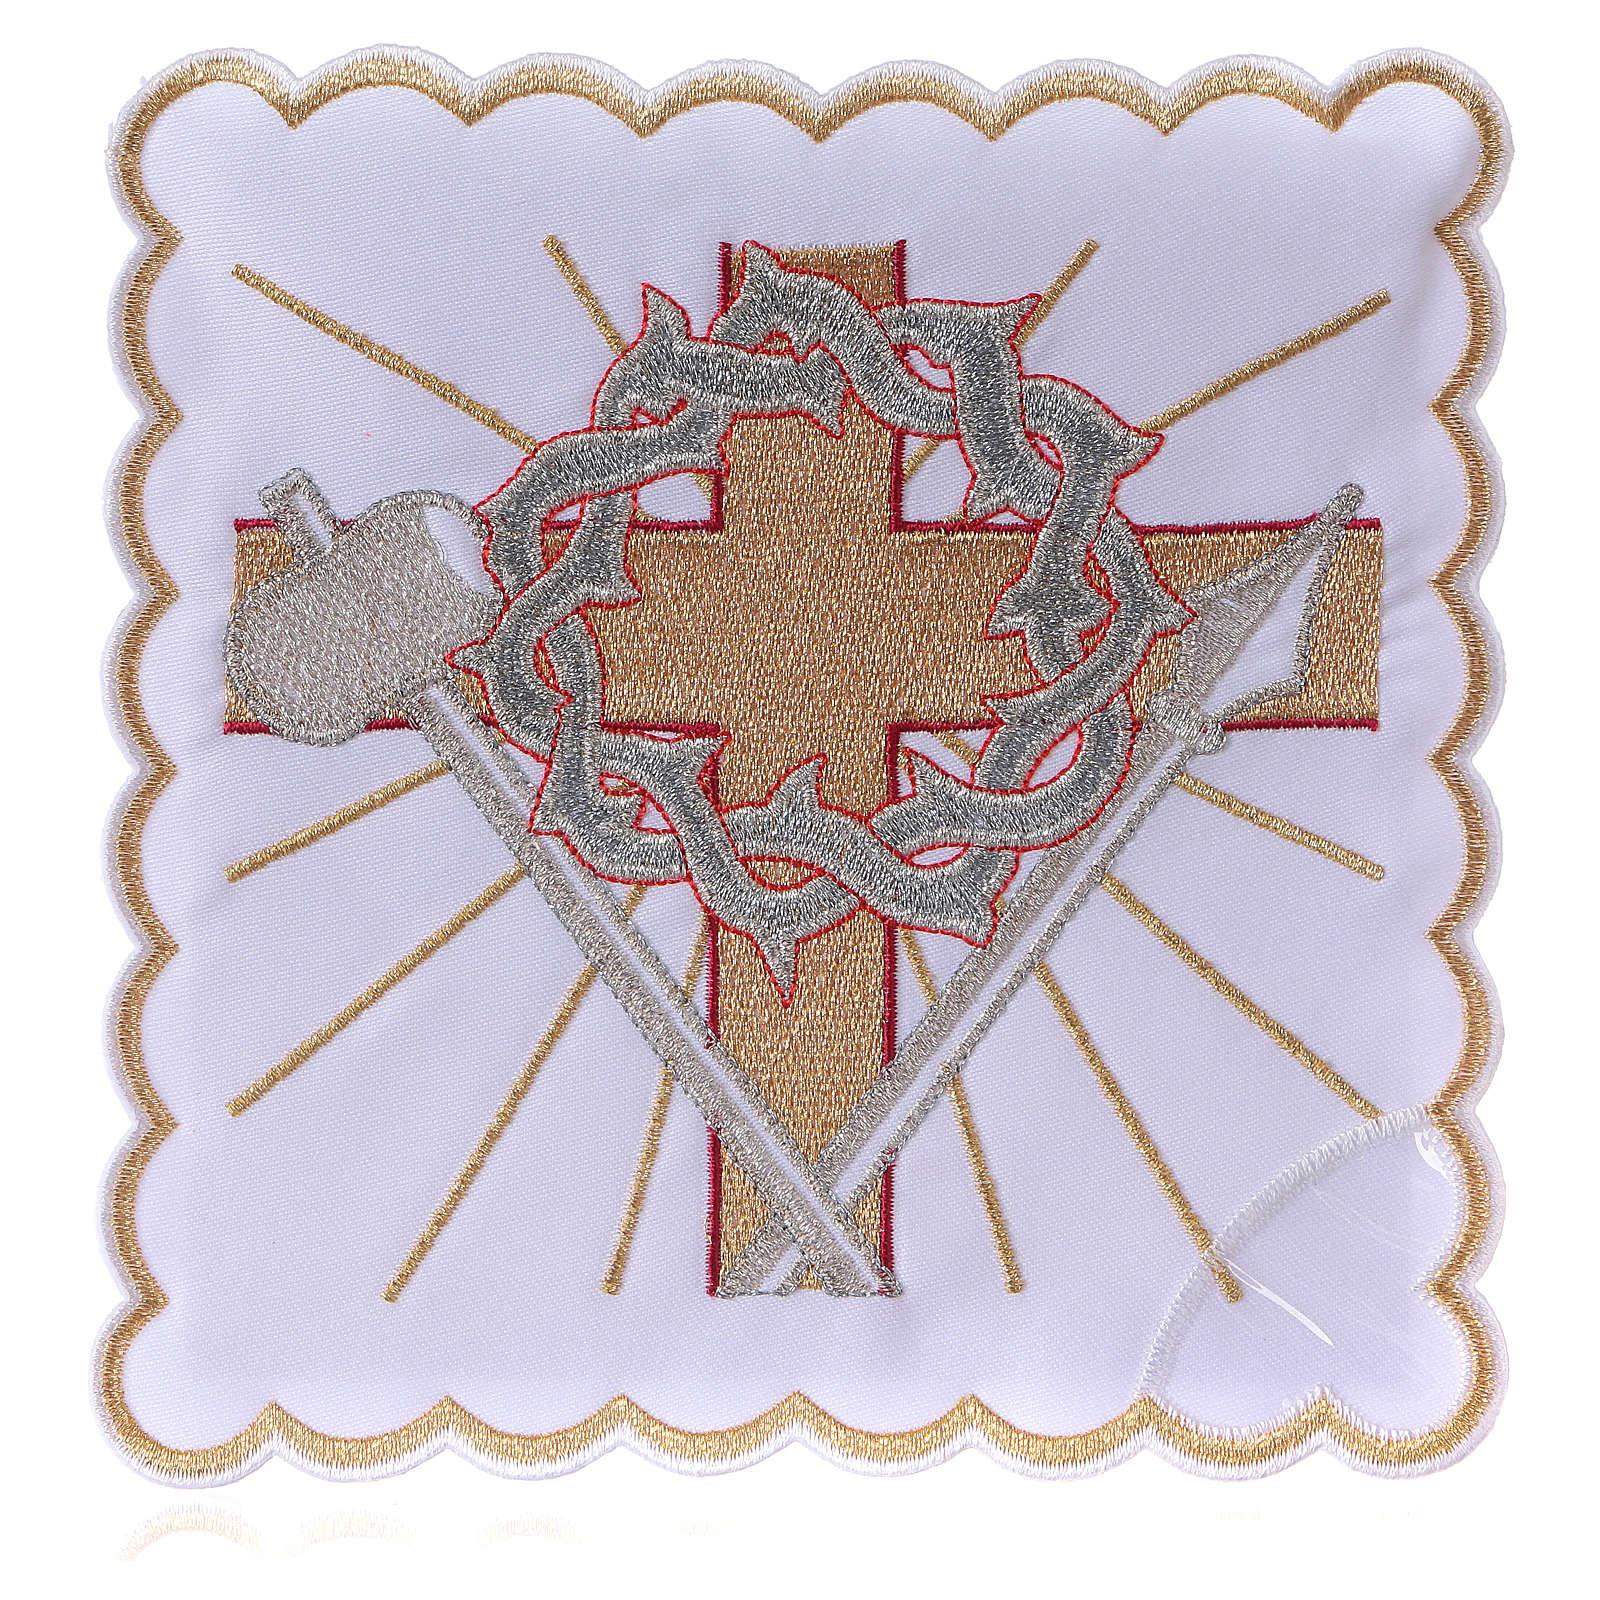 Altar linen cross spear & crown of thorns, cotton 4